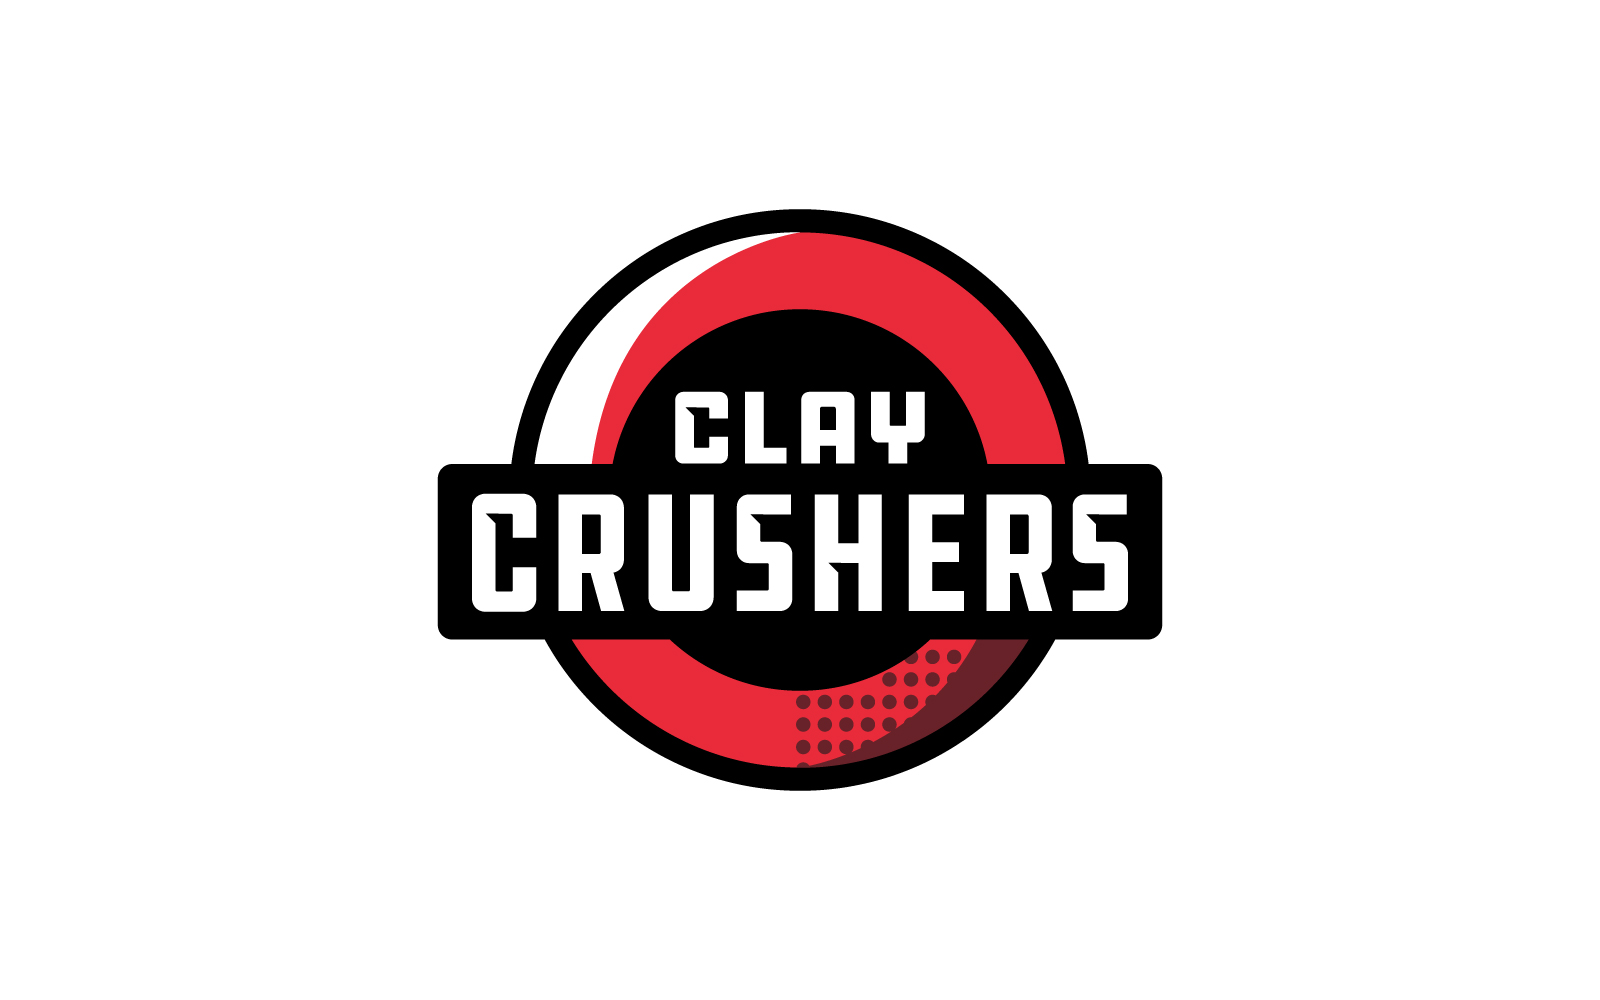 clay-crushers.jpg